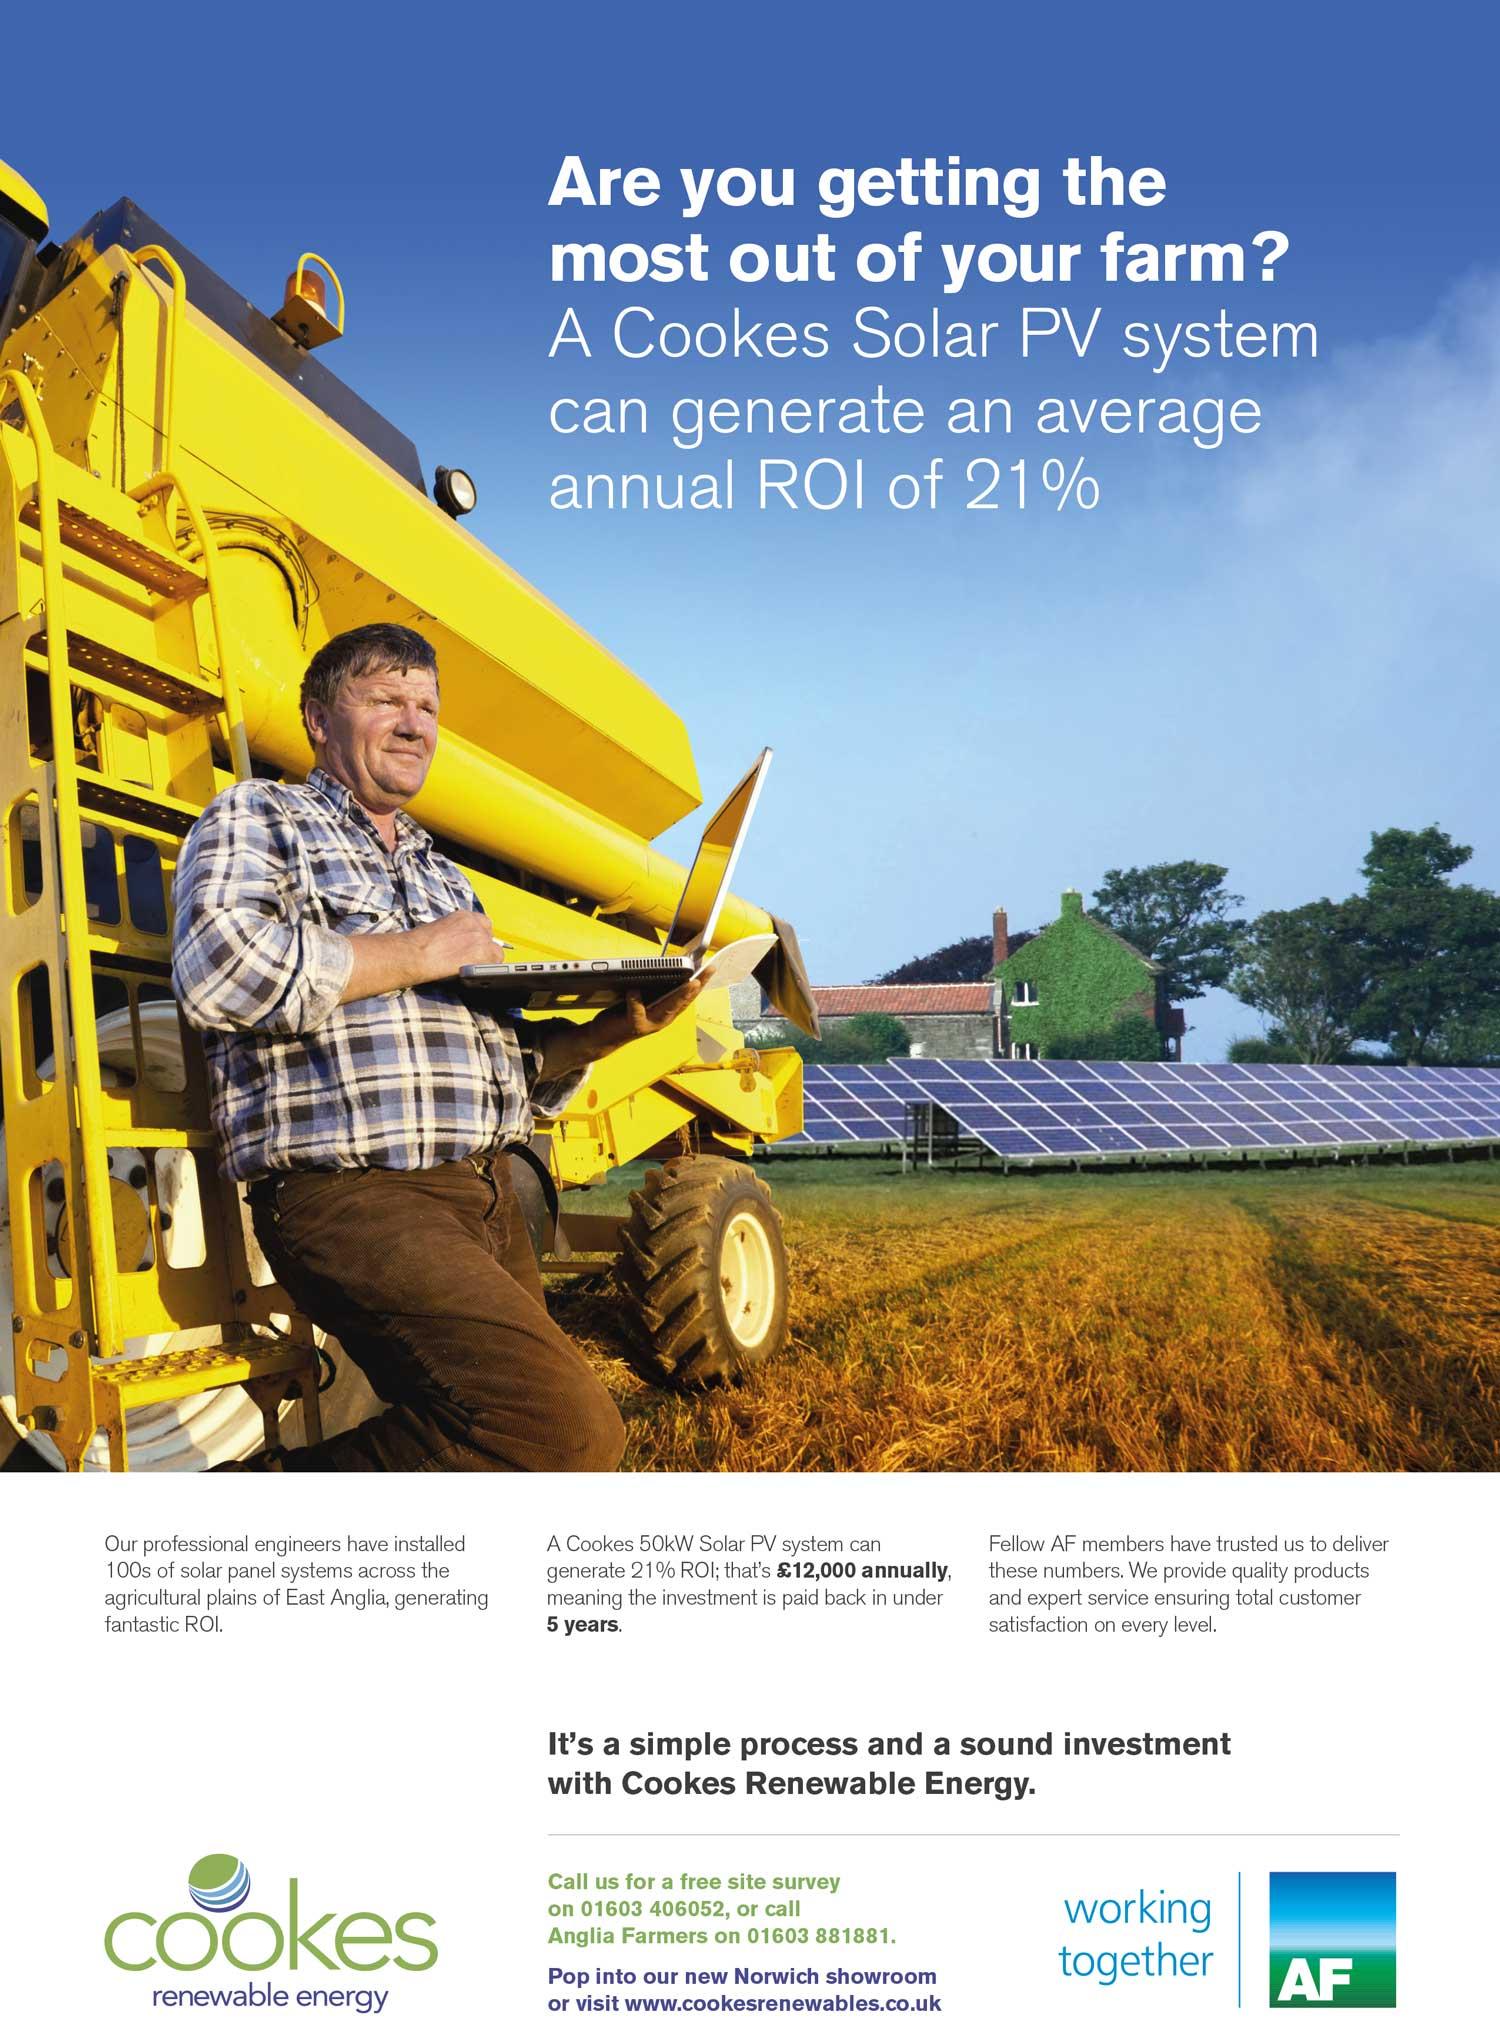 Magazine advertising for Cookes renewable energy